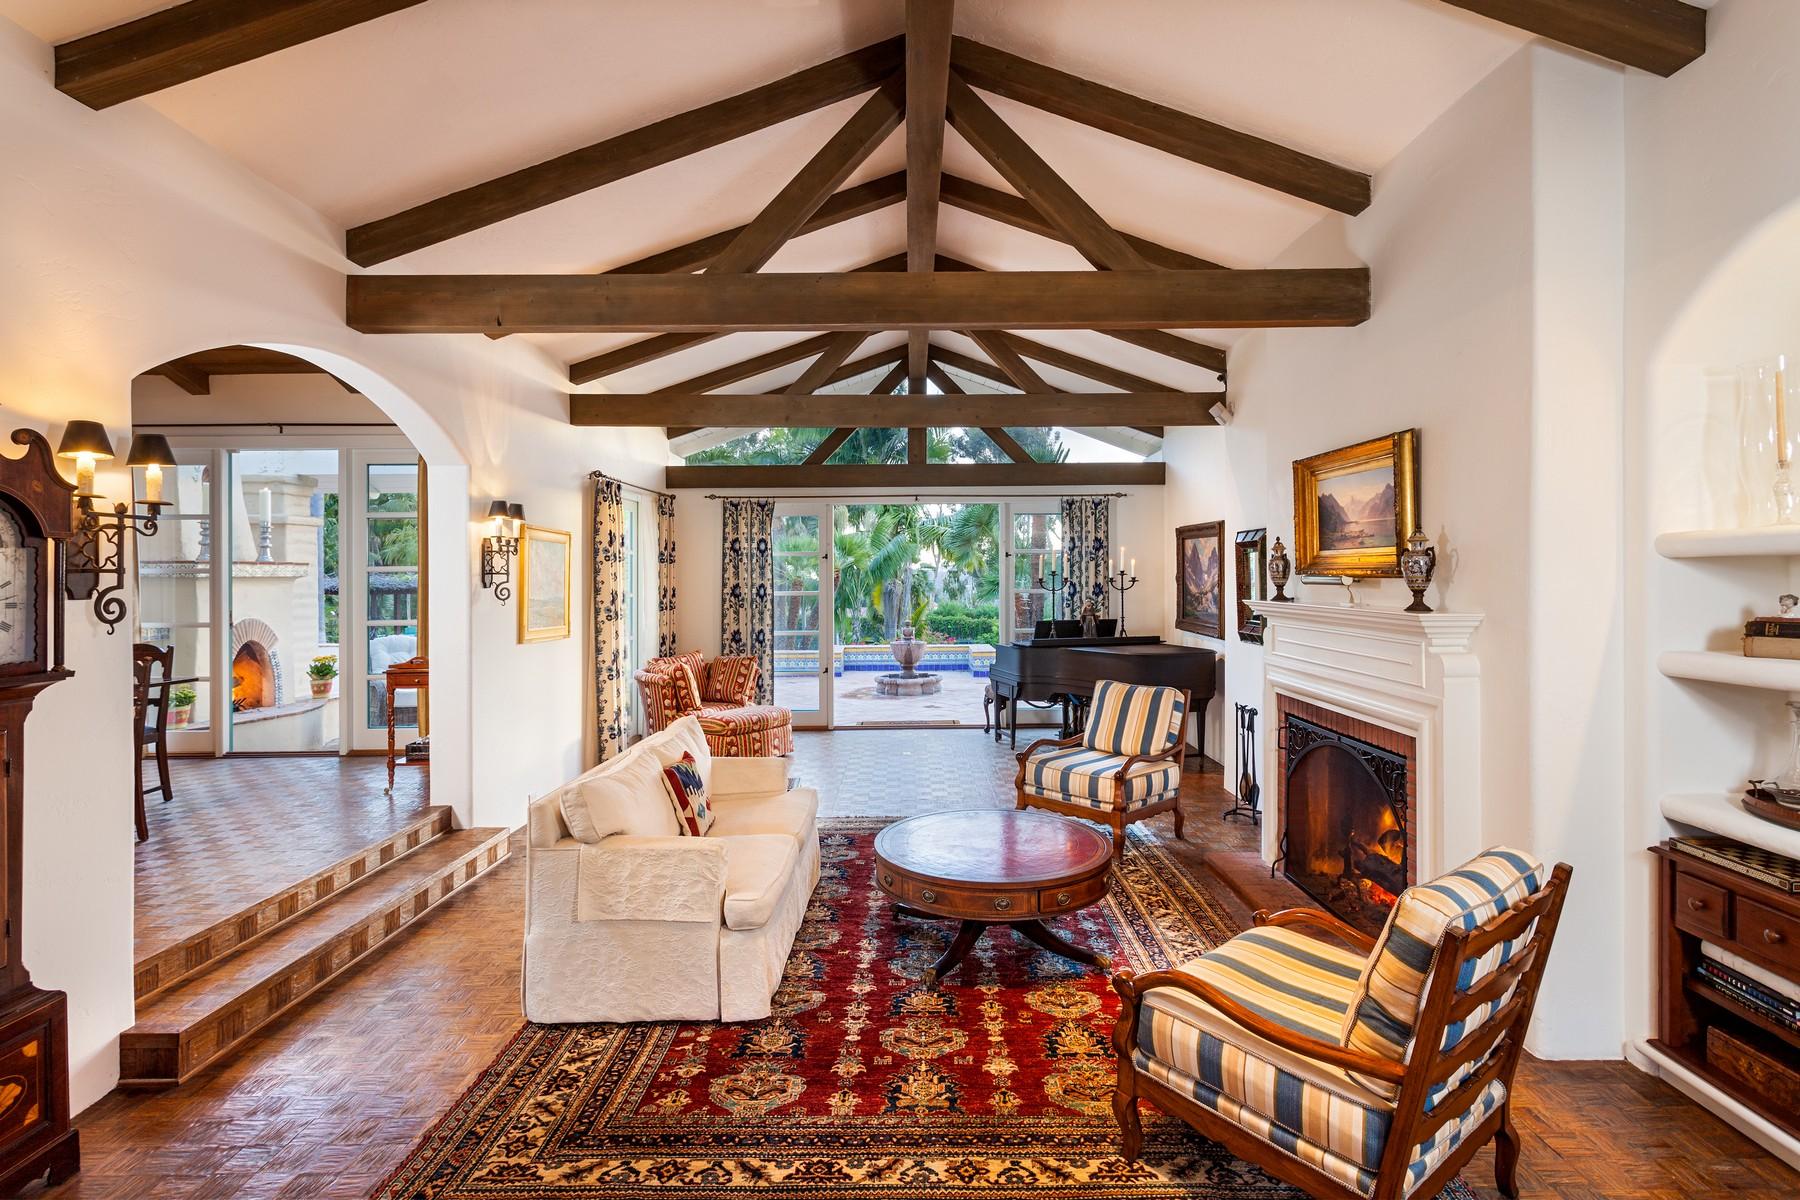 Single Family Home for Sale at 5109 El Mirlo Rancho Santa Fe, California 92067 United States